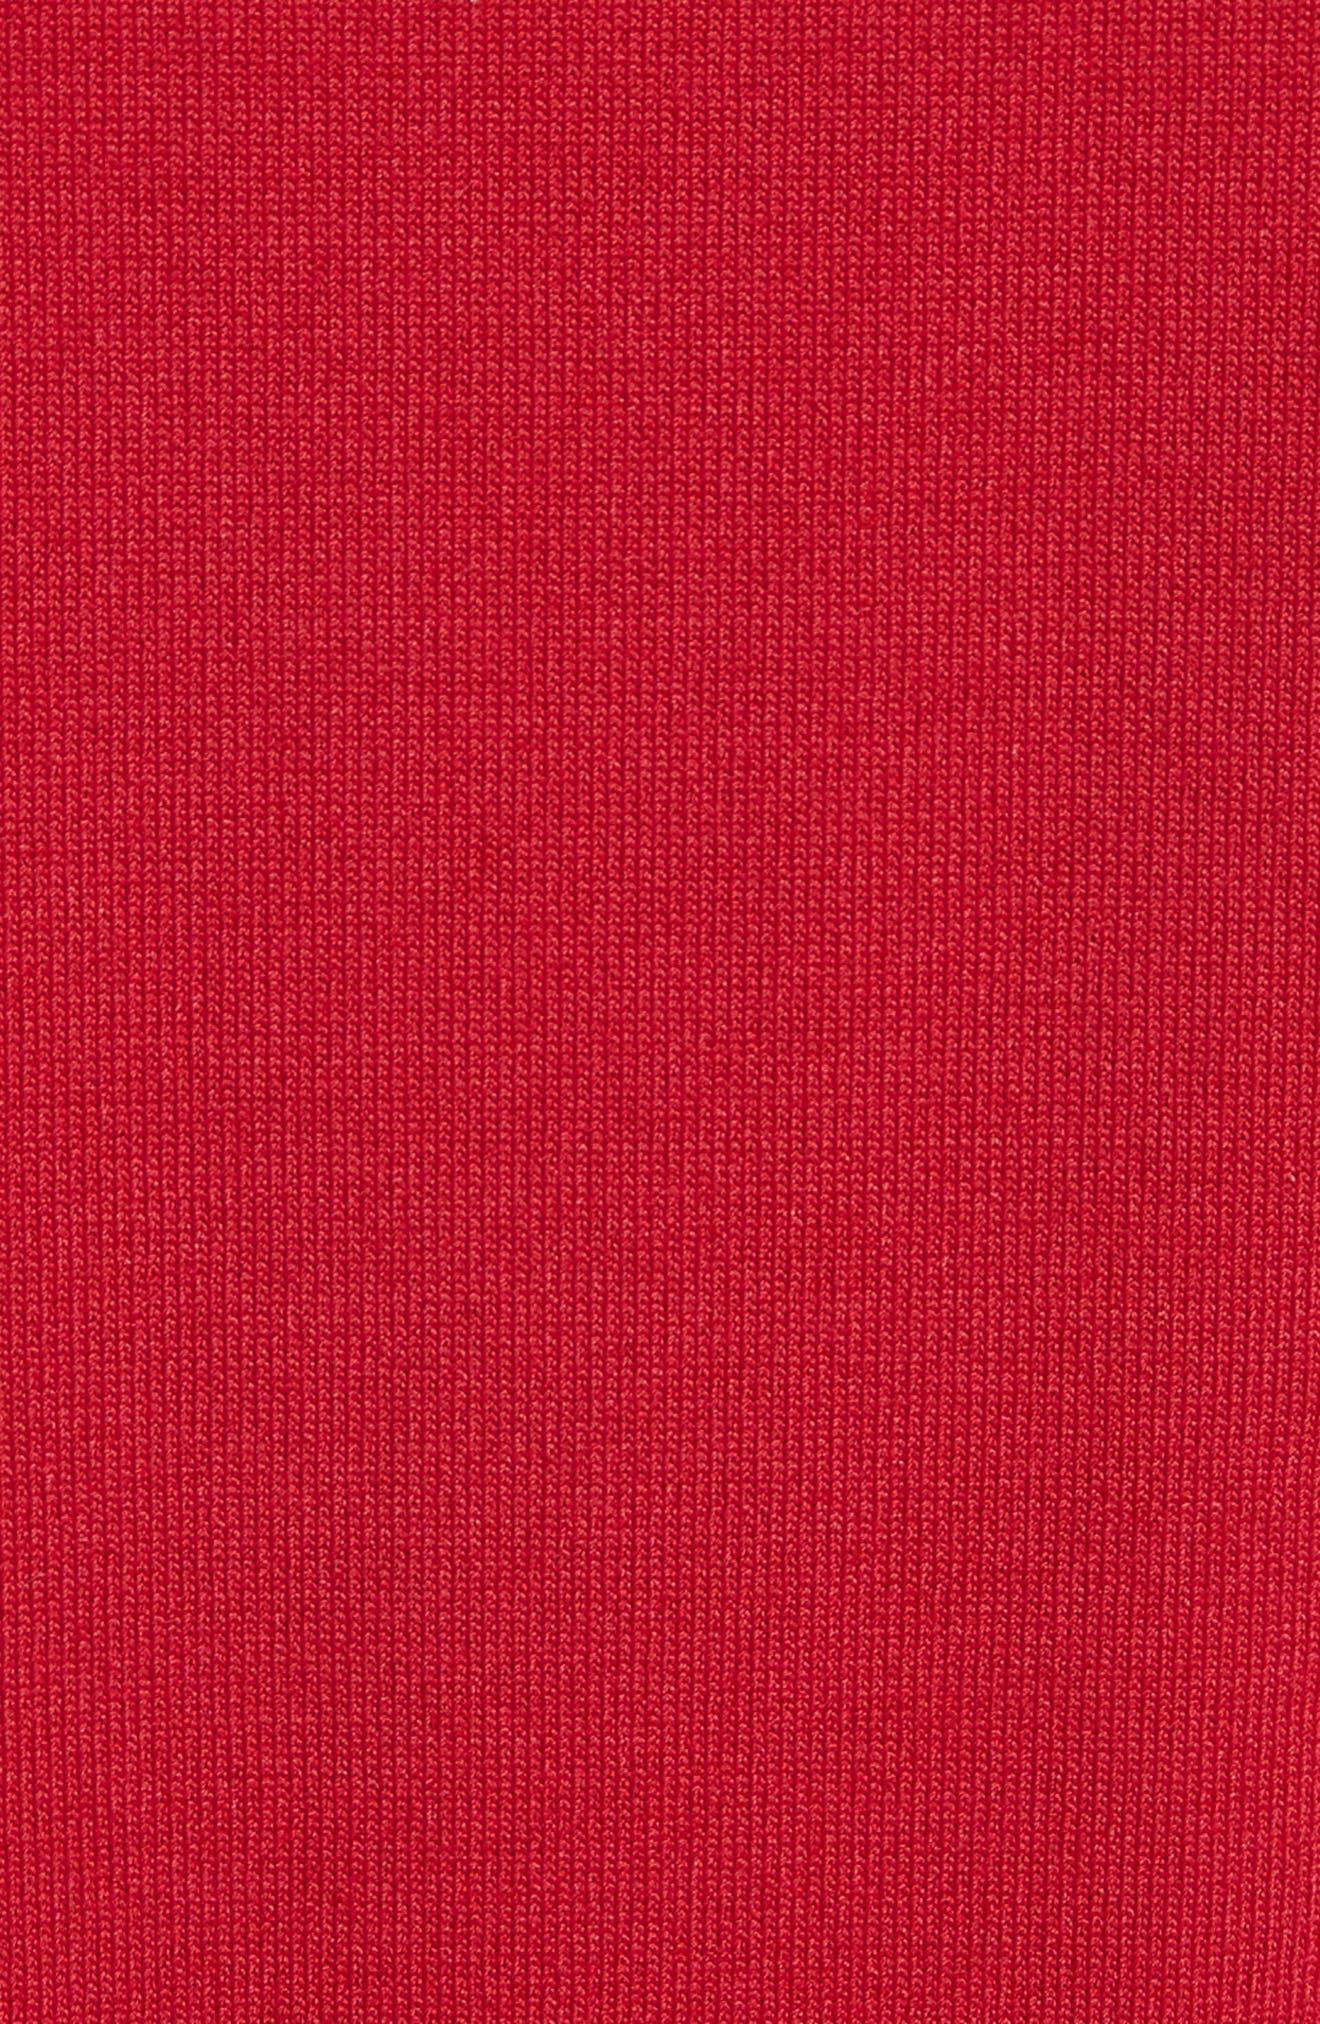 Alternate Image 5  - RED Valentino Bow Knit Dress